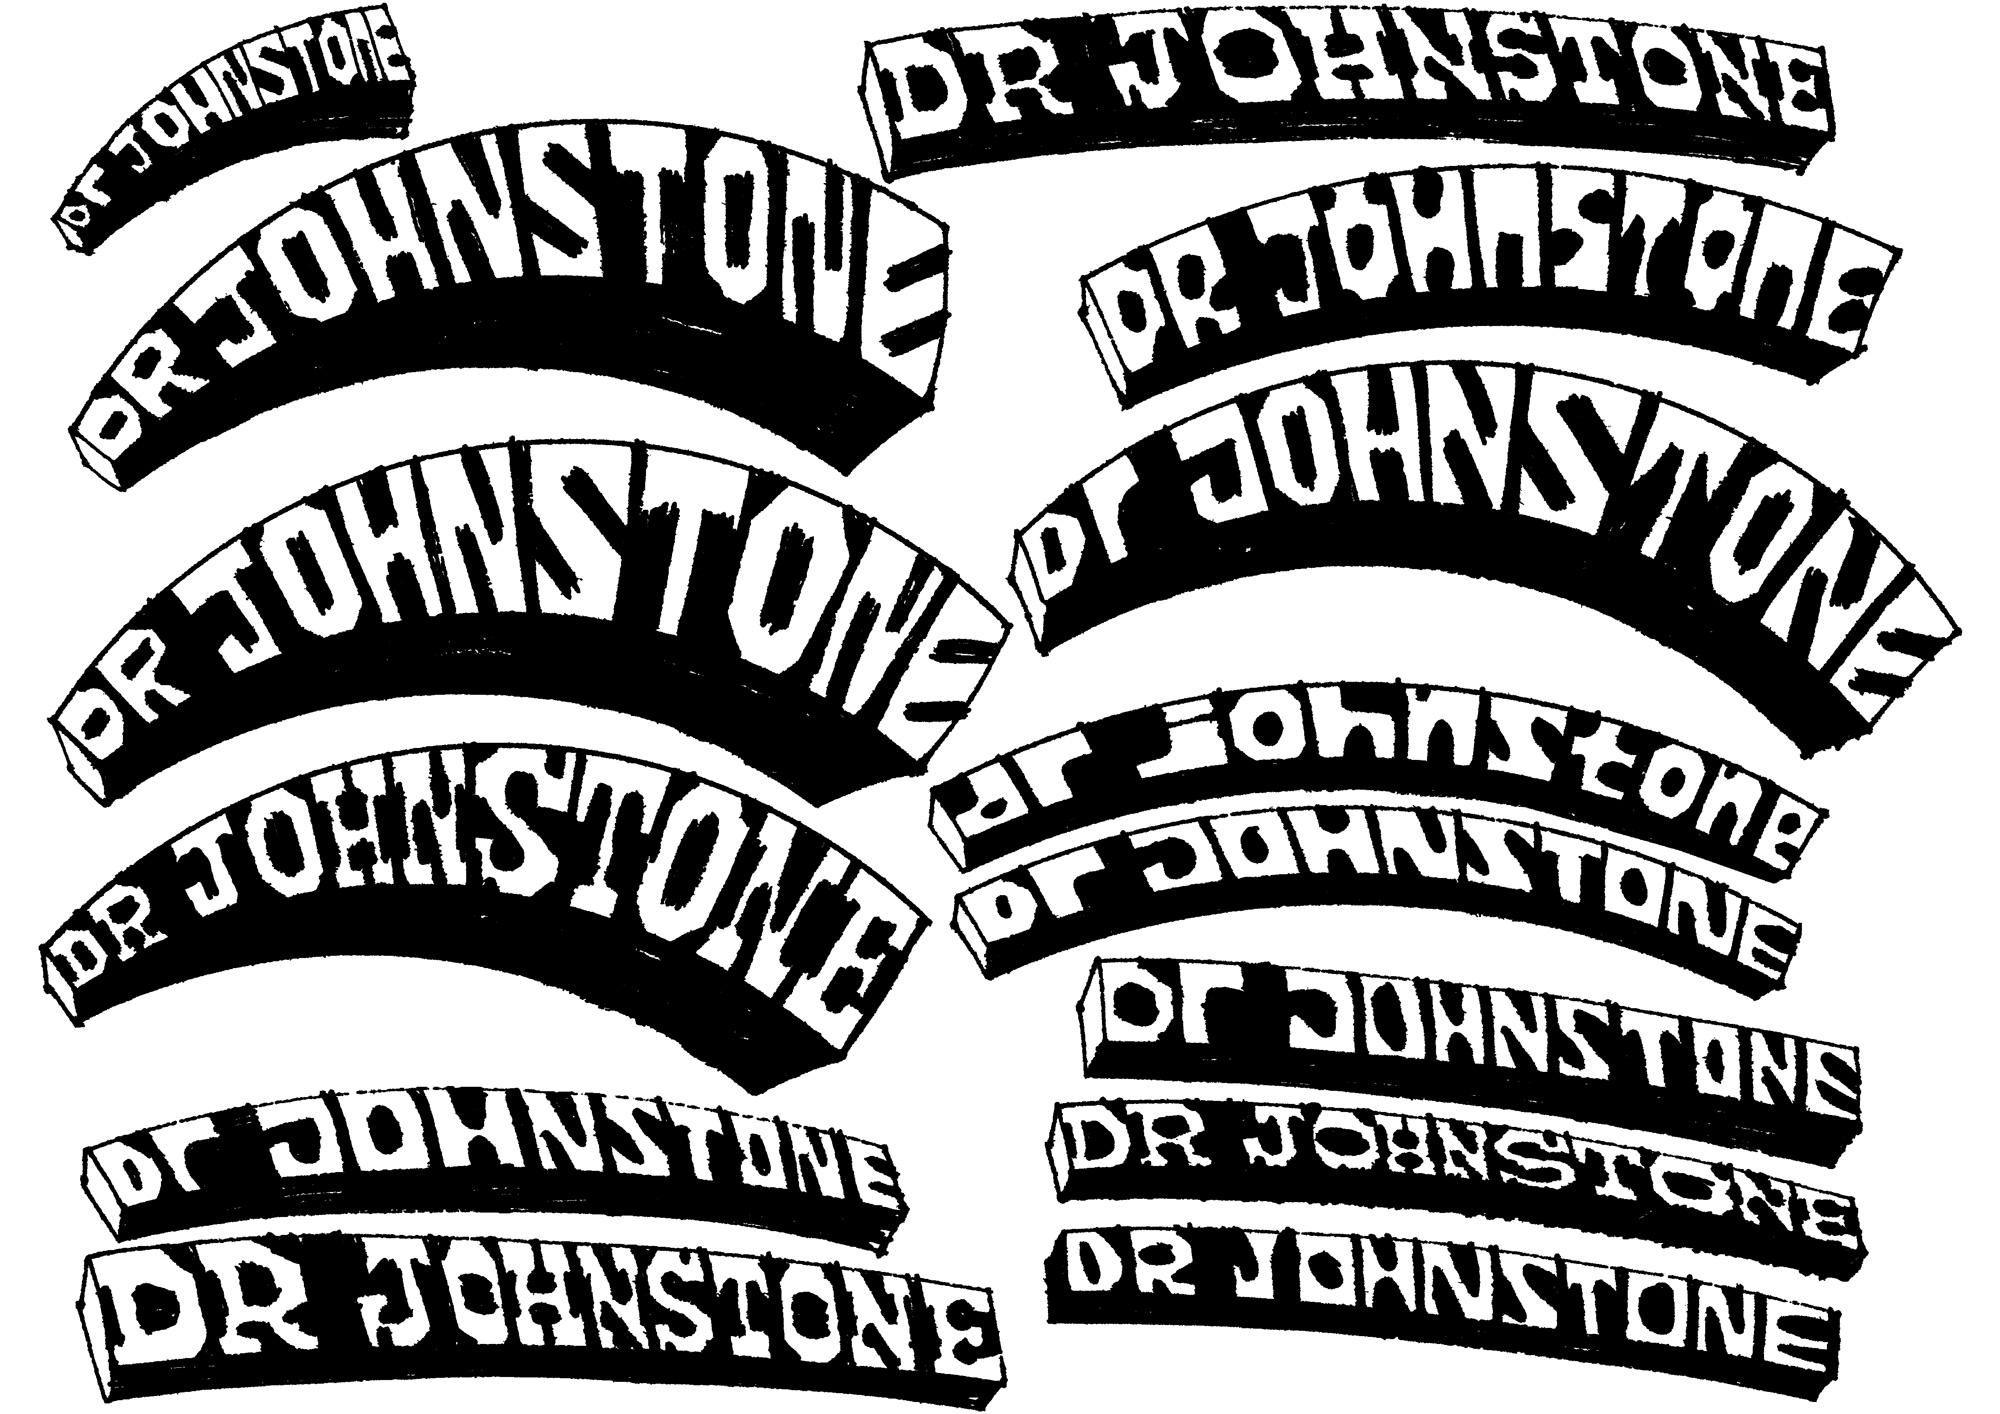 Dr. Johnstone Logos